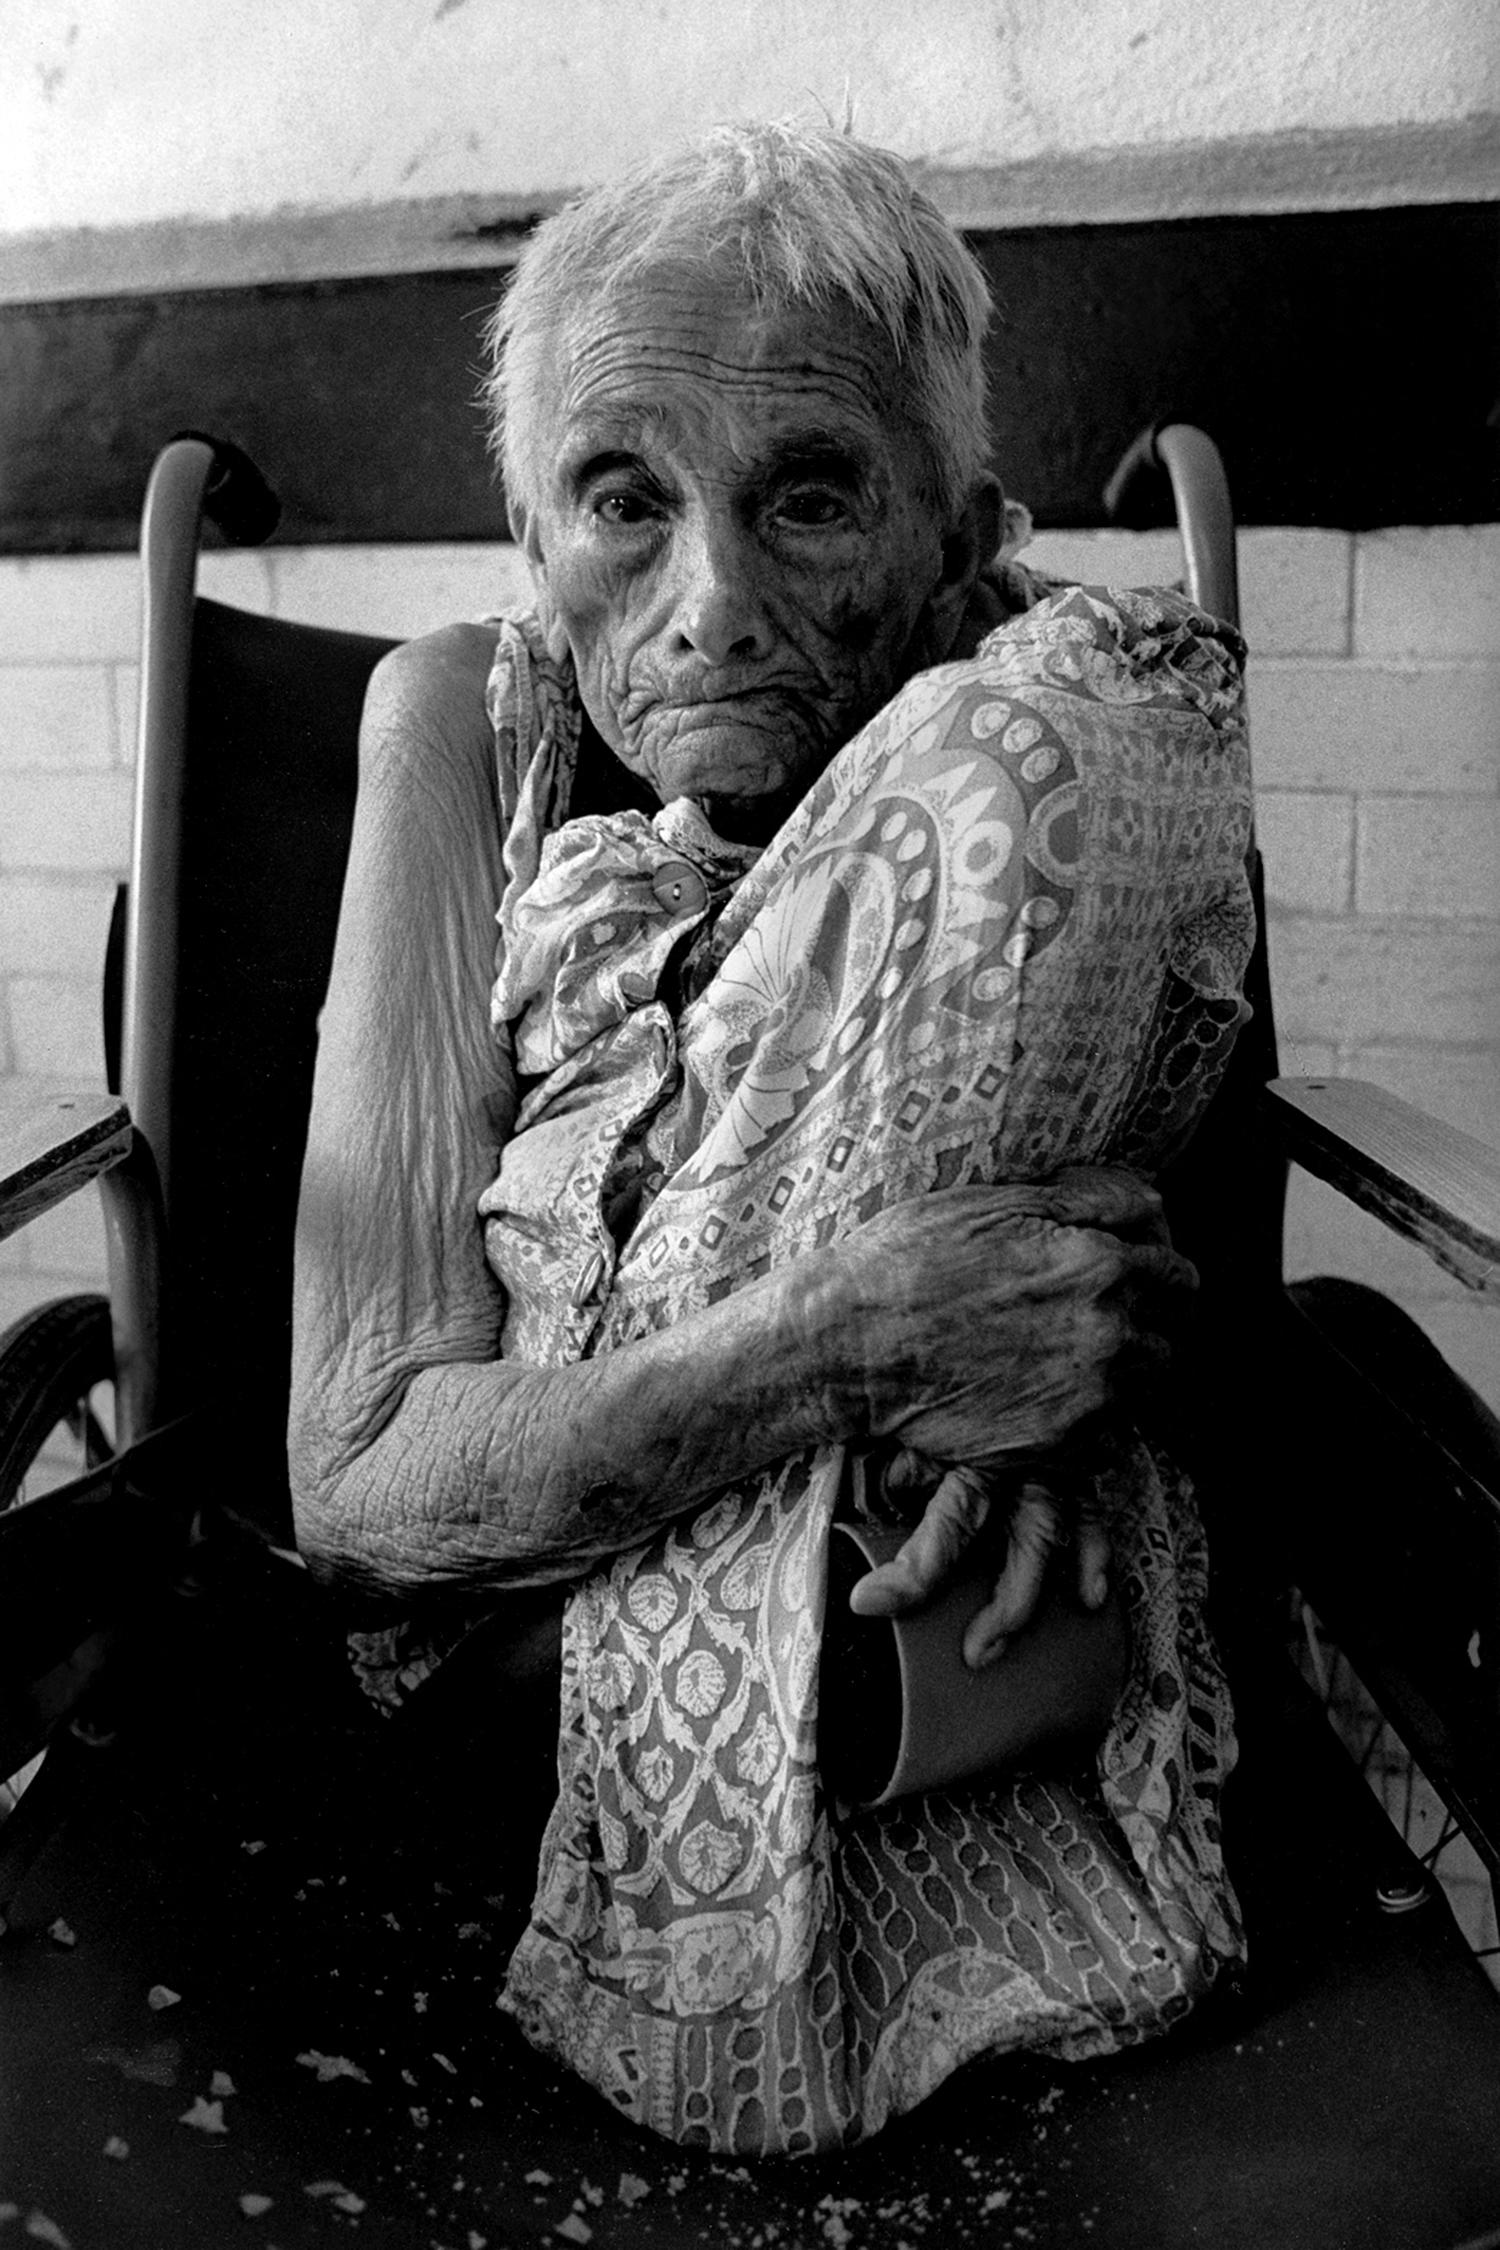 Elderly woman who may have Alzheimer's disease  Ocaranza Psychiatric Hospital Hidalgo, Mexico 1999